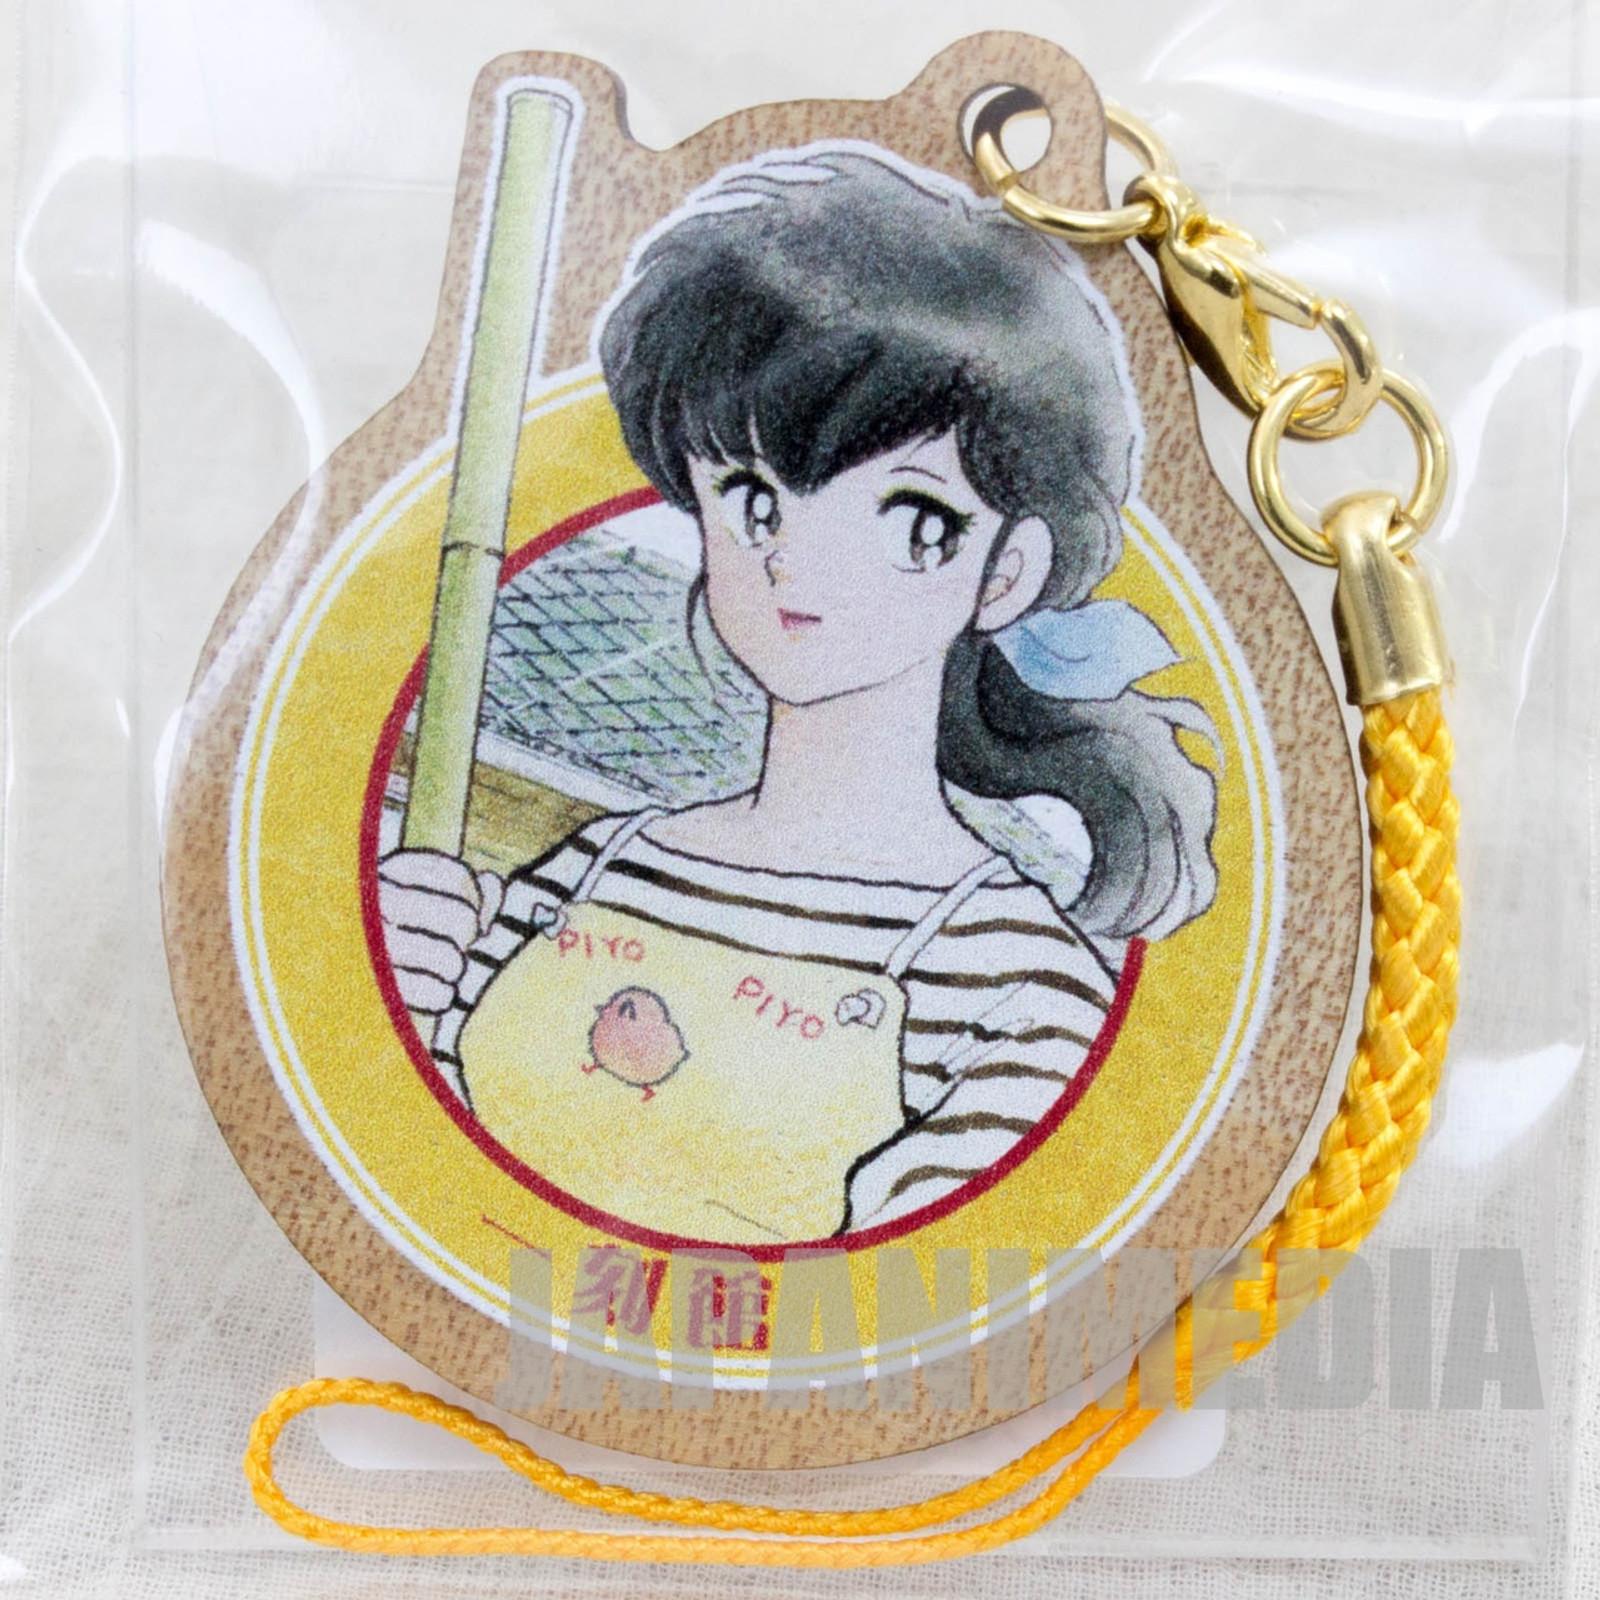 Maison Ikkoku Kyoko Otonashi Wooden Mascot Charm Strap JAPAN ANIME MANGA 2